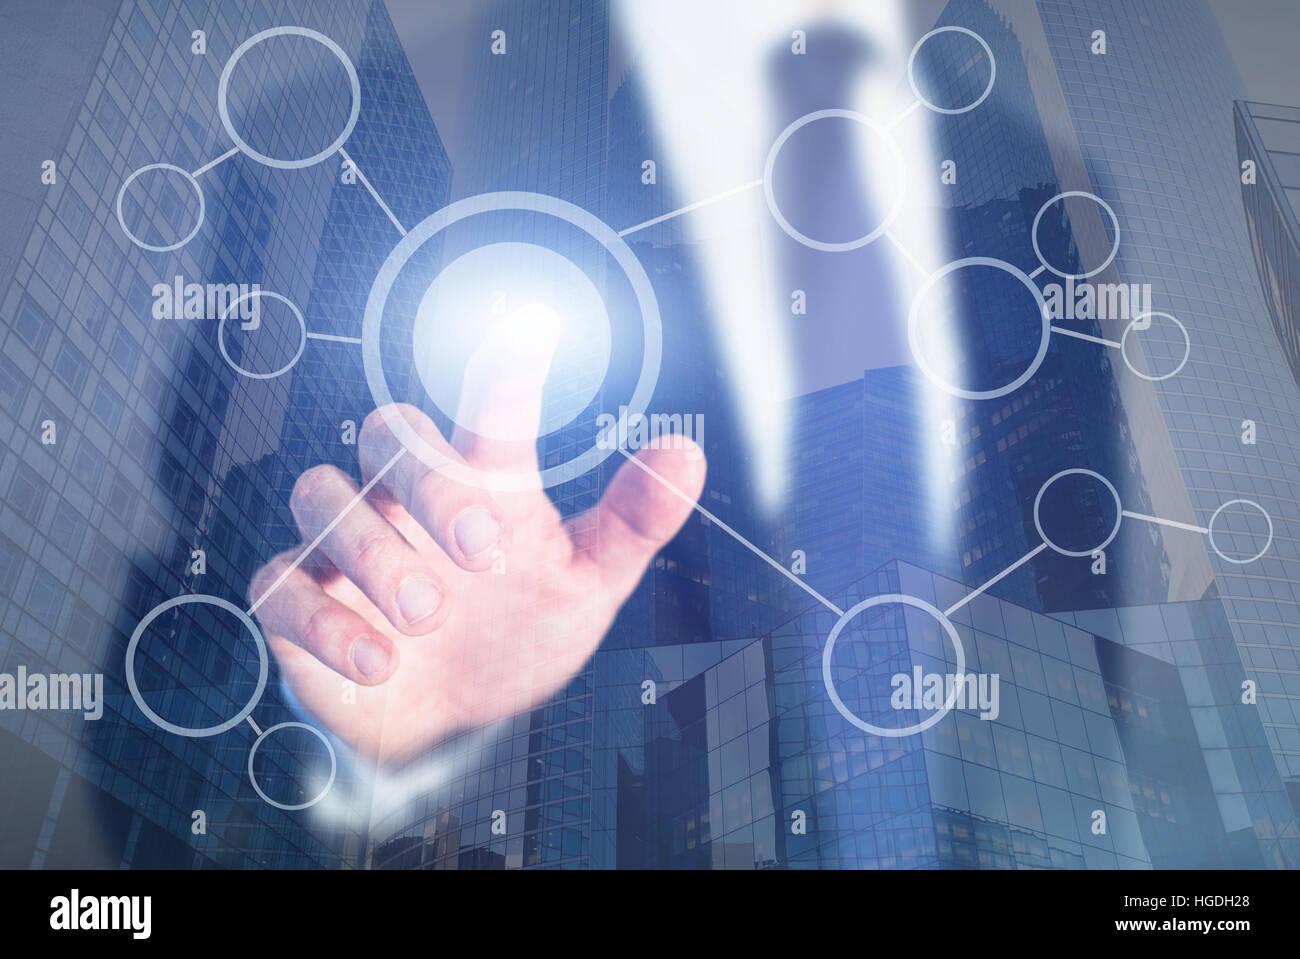 Diagrama de flujo en blanco pantalla táctil abstracto, proceso de negocio o concepto de objetivo Imagen De Stock